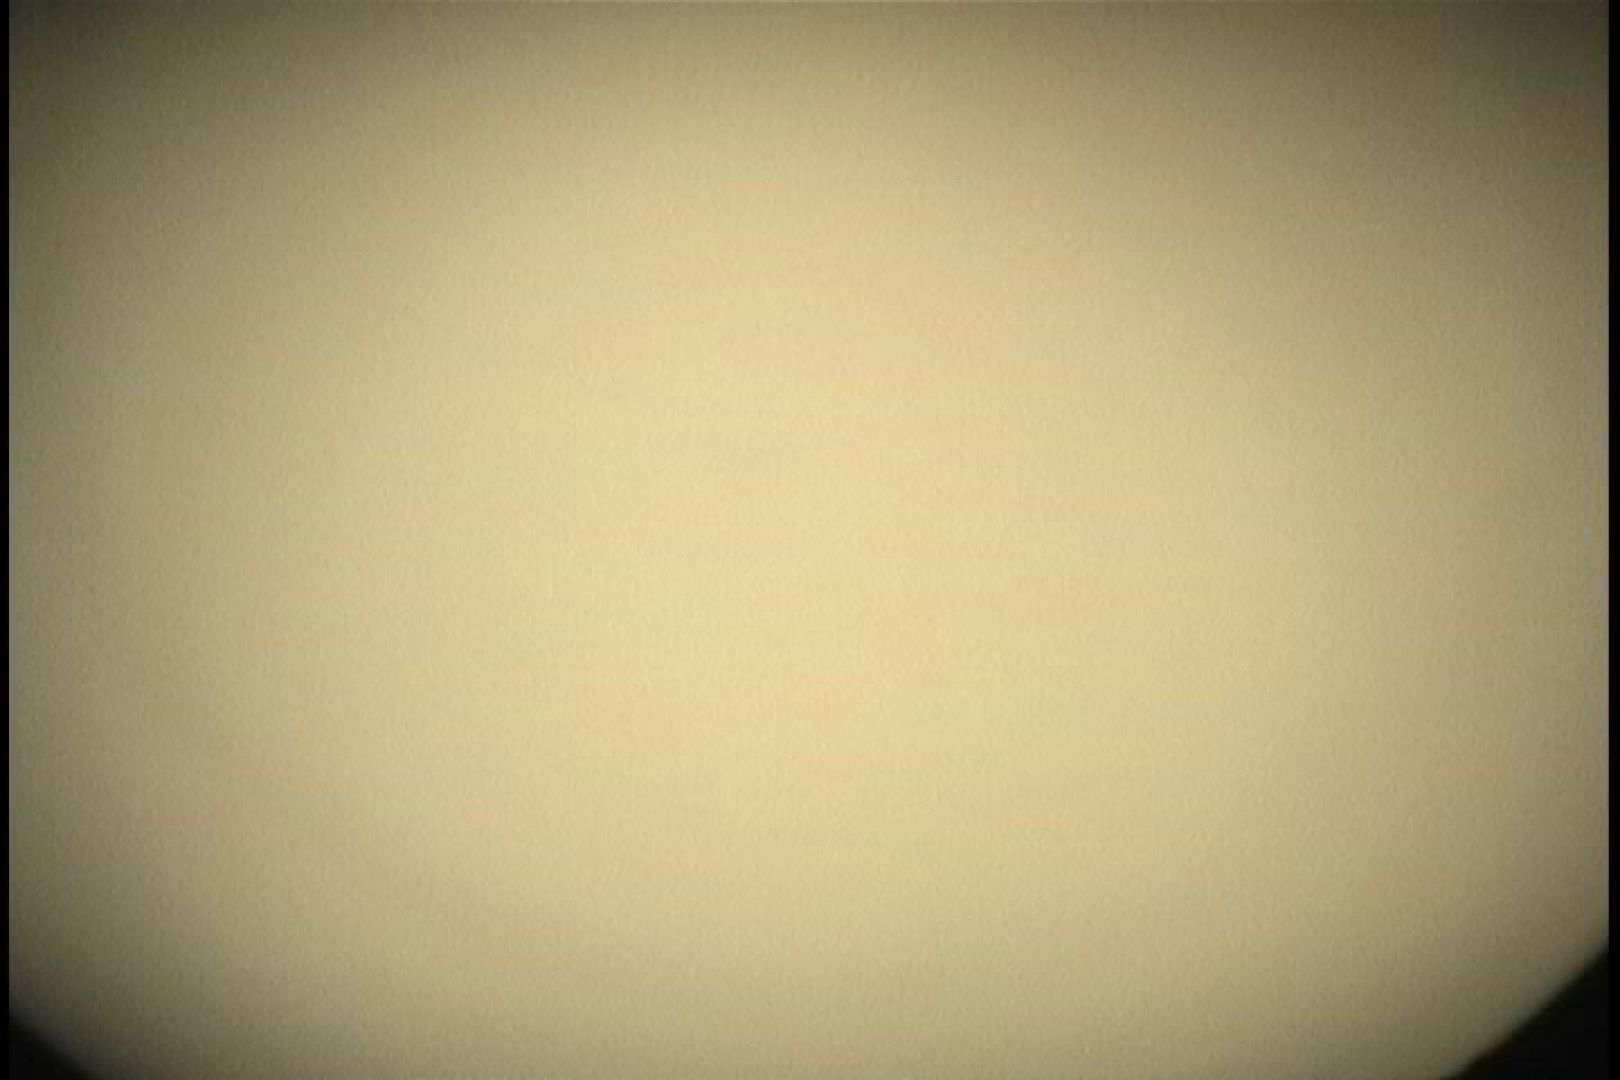 No.32 脇とVラインの処理が甘い貧乳ギャル、タンポンの紐がぶらぶら シャワー室 | 乙女H映像  88画像 73